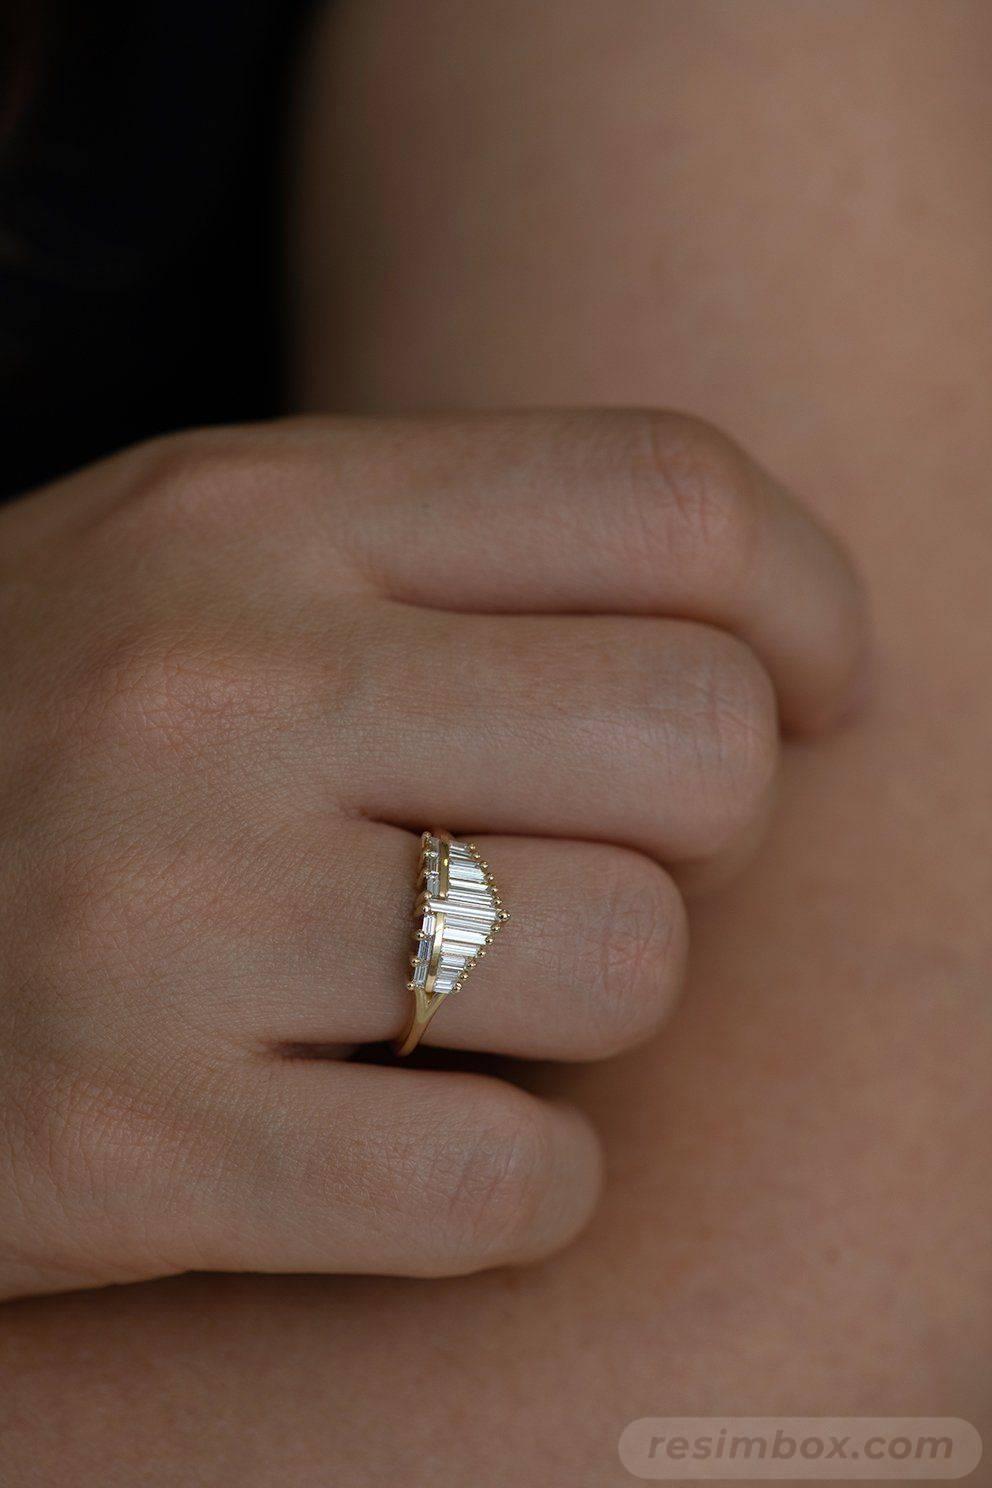 Art deco engagement ring-498070040039524139